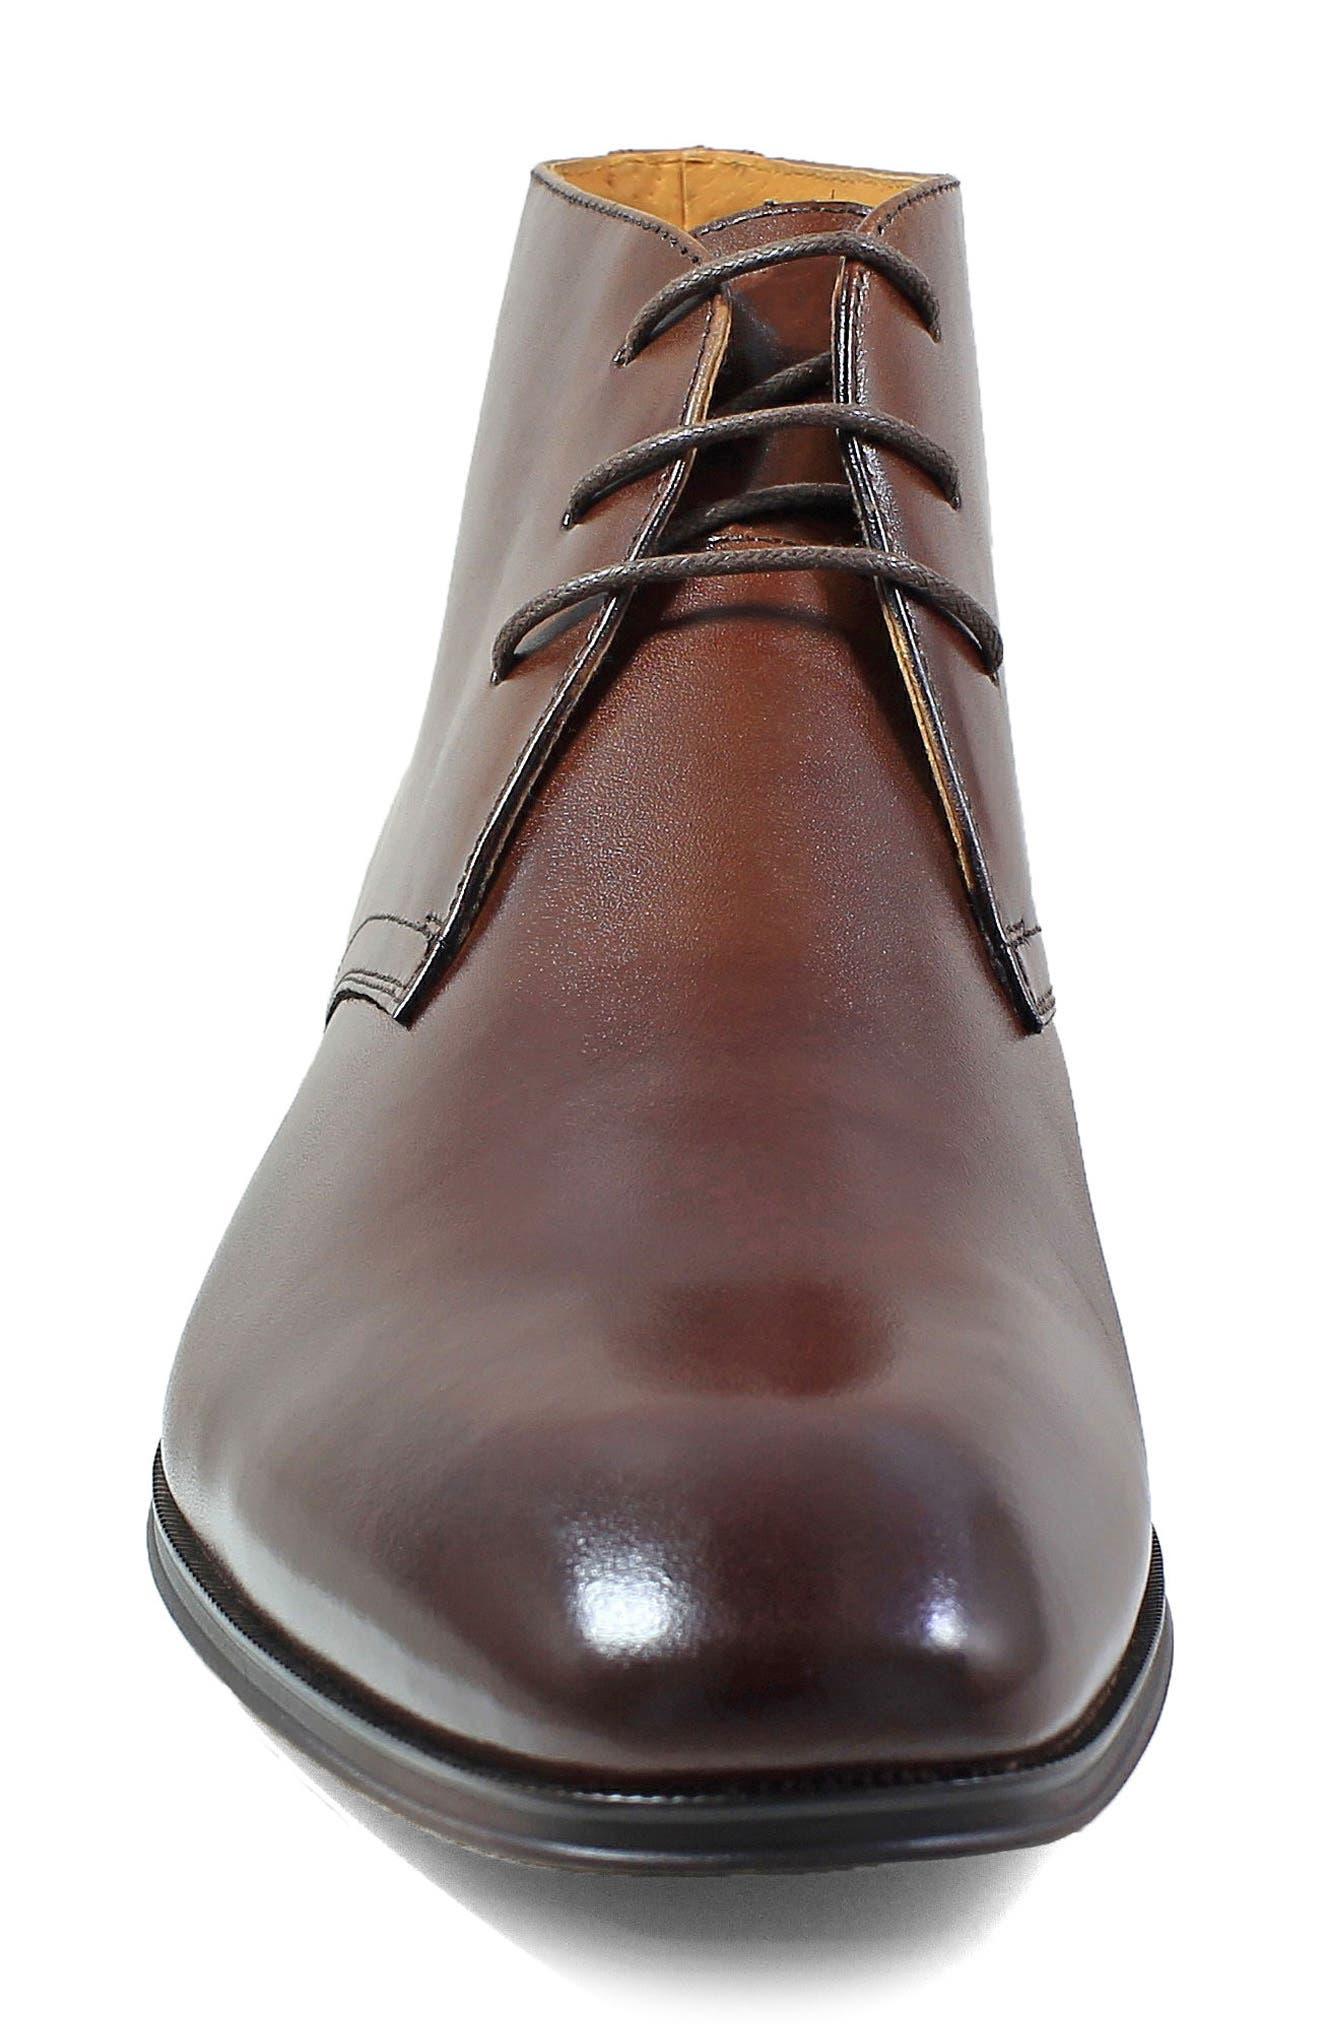 Corbetta Chukka Boot,                             Alternate thumbnail 4, color,                             Cognac Leather